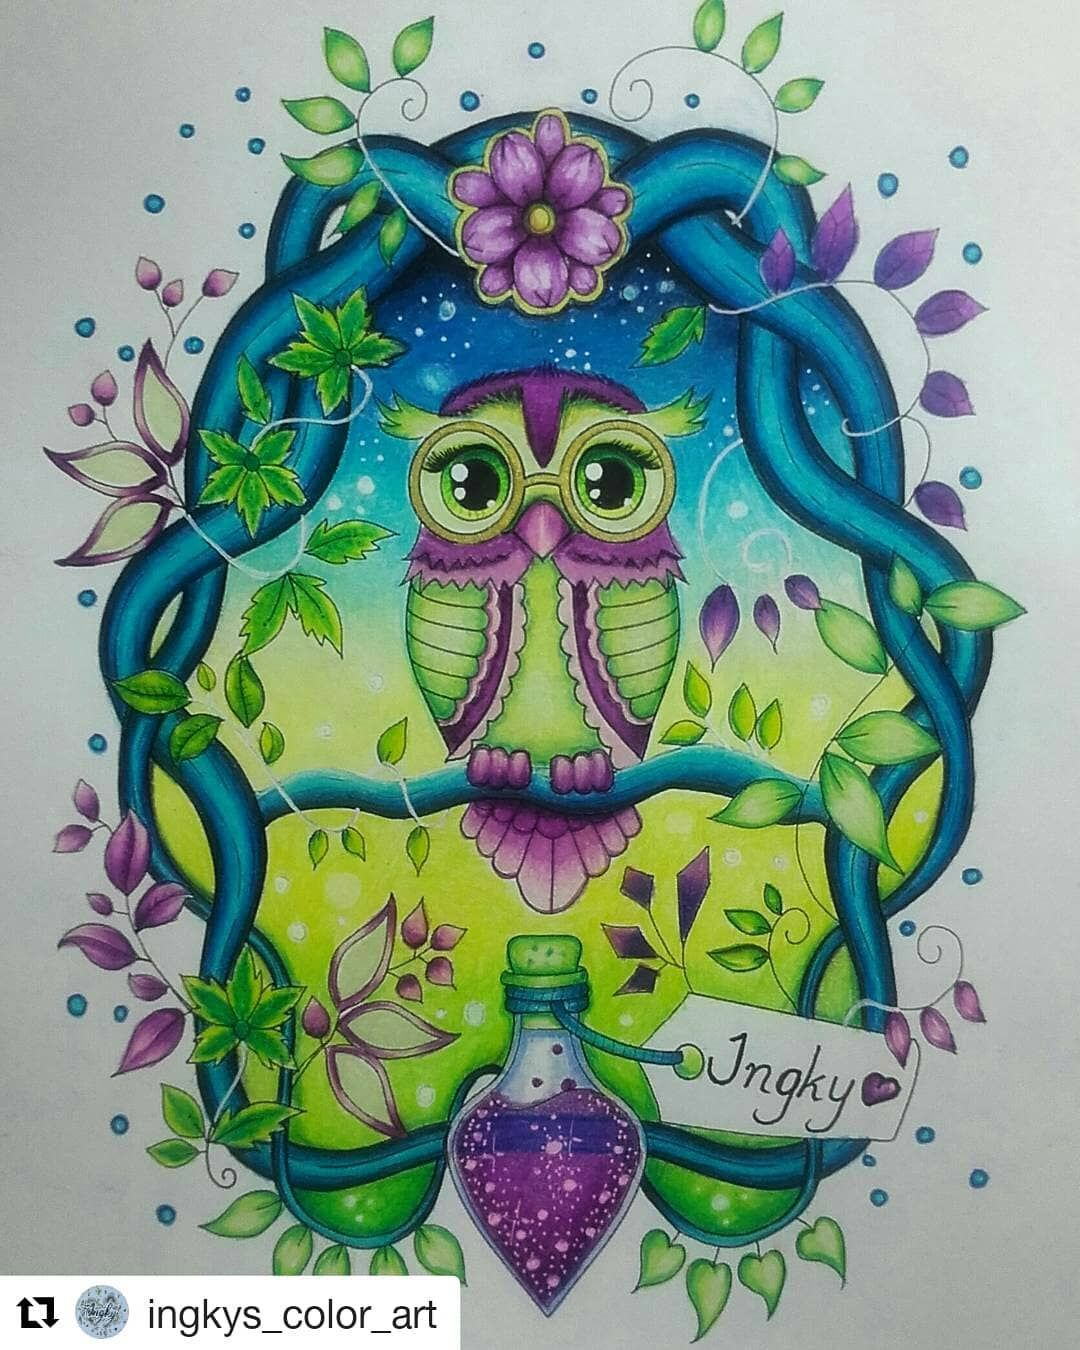 goodnight #sessãocoruja #Repost @ingkys_color_art (@get_repost